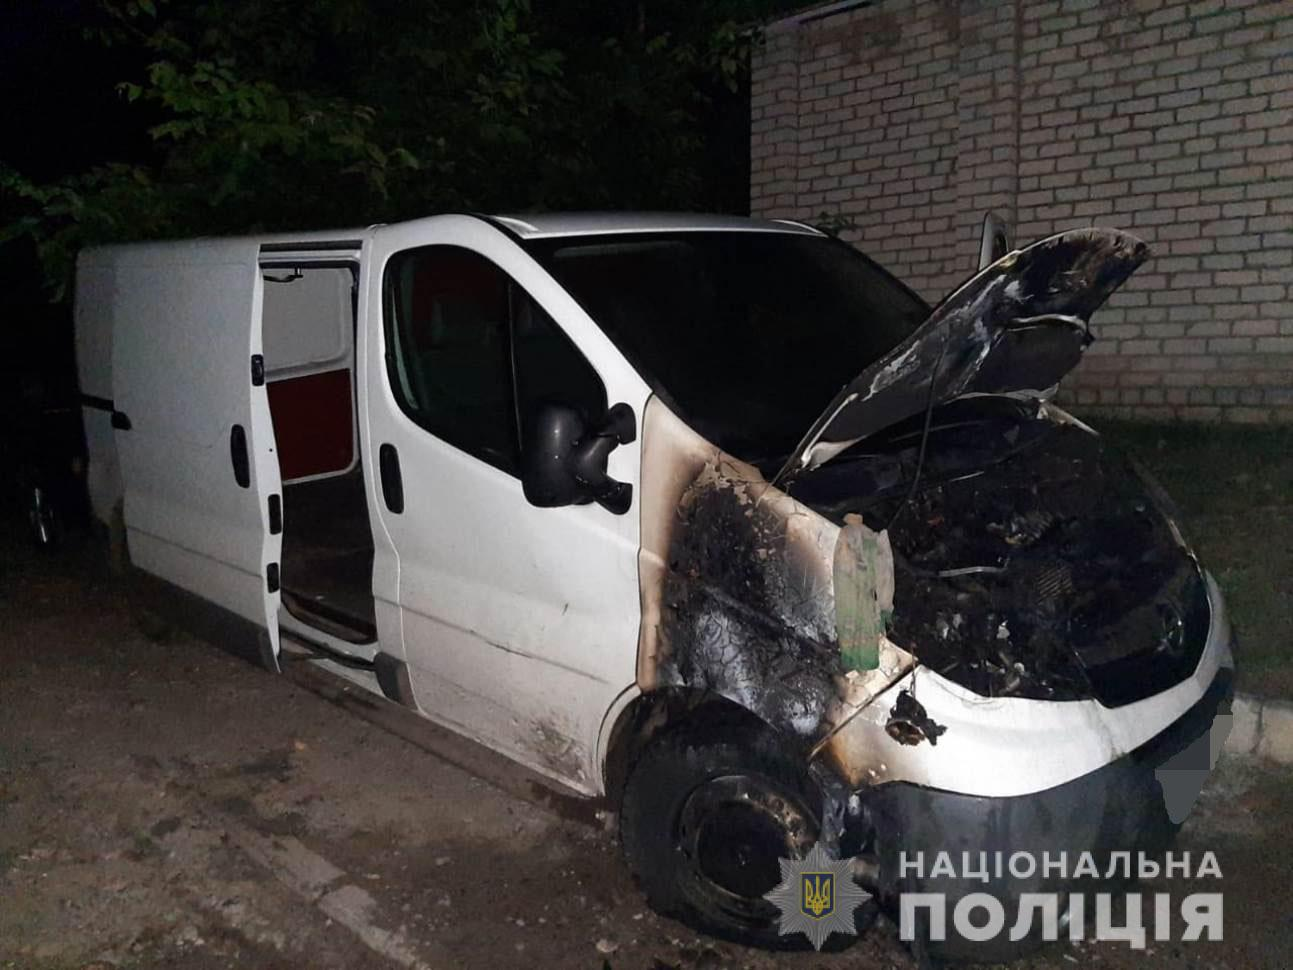 На Харковщине сгорела иномарка. Возможен поджог (фото)